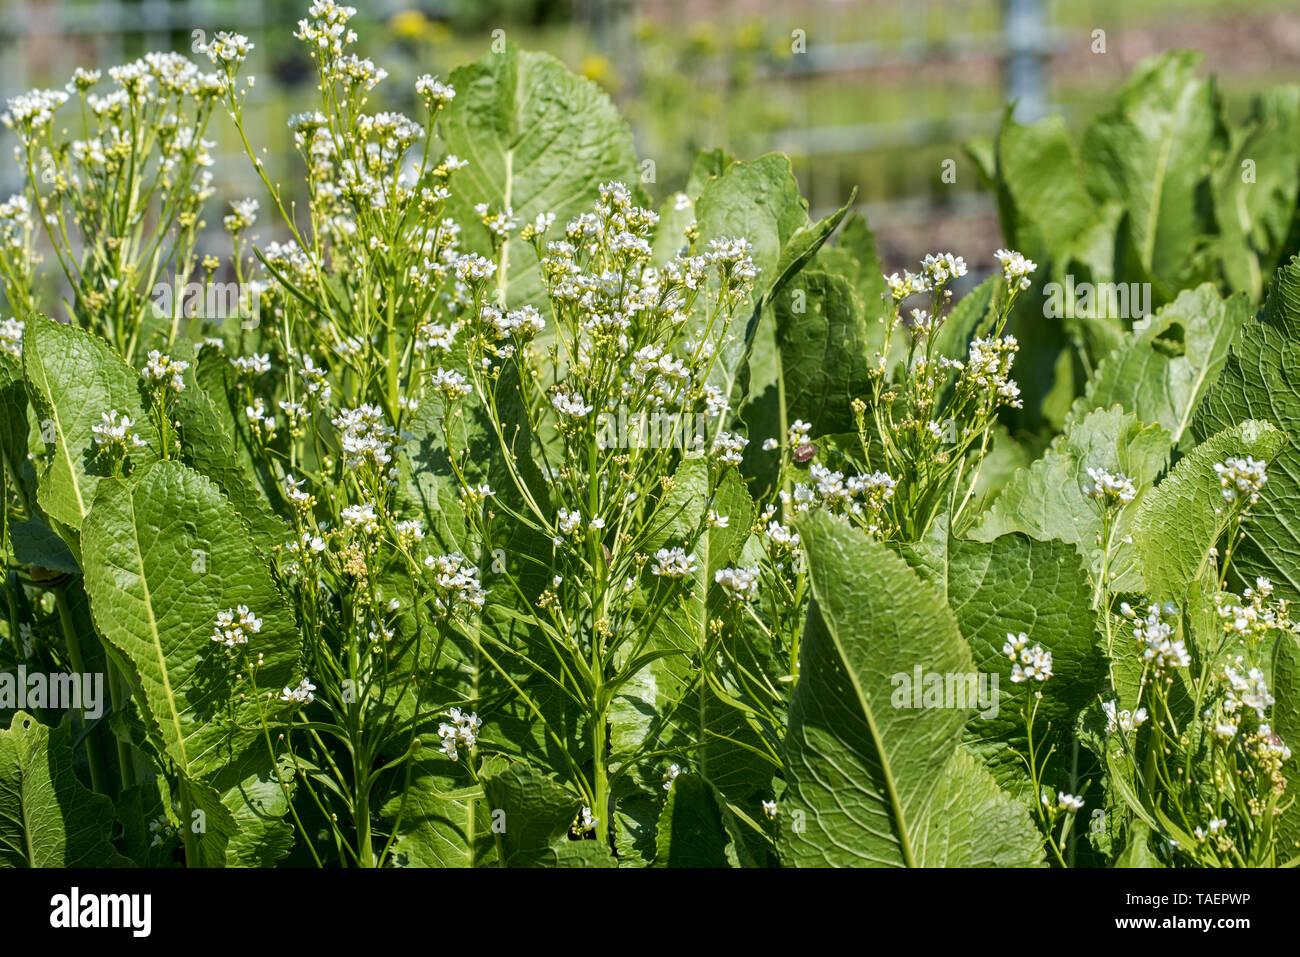 Horseradish (Armoracia rusticana / Cochlearia armoracia) in flower, native to southeastern Europe and western Asia Stock Photo